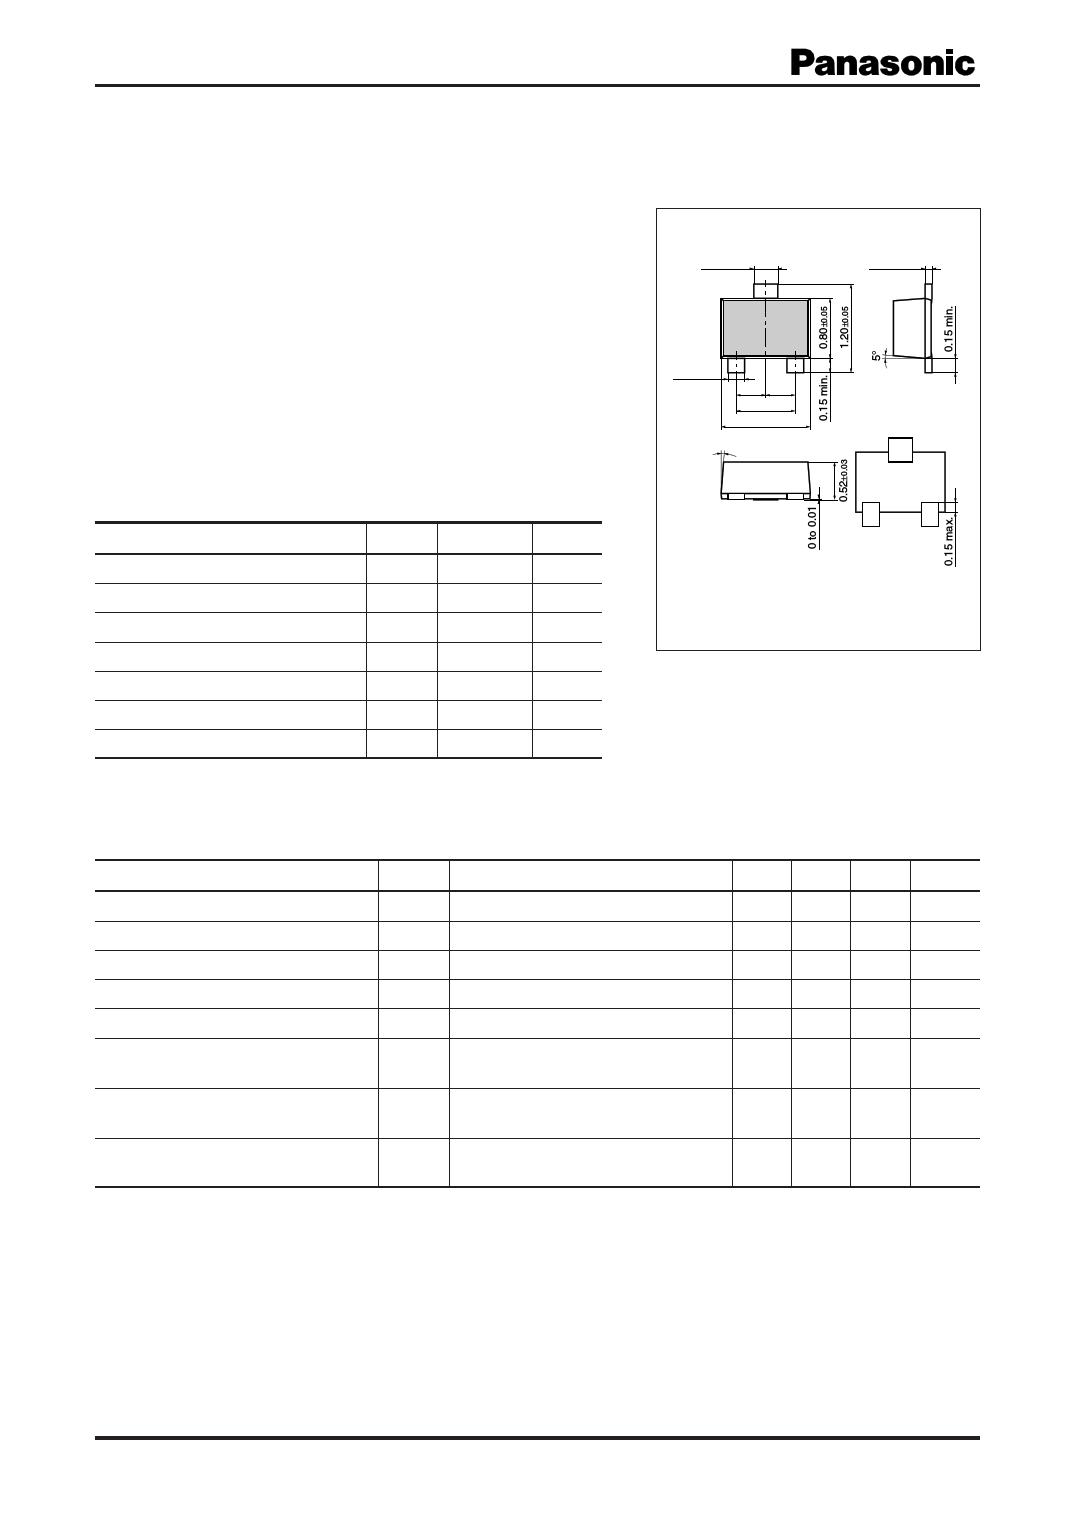 K3396 Datenblatt PDF